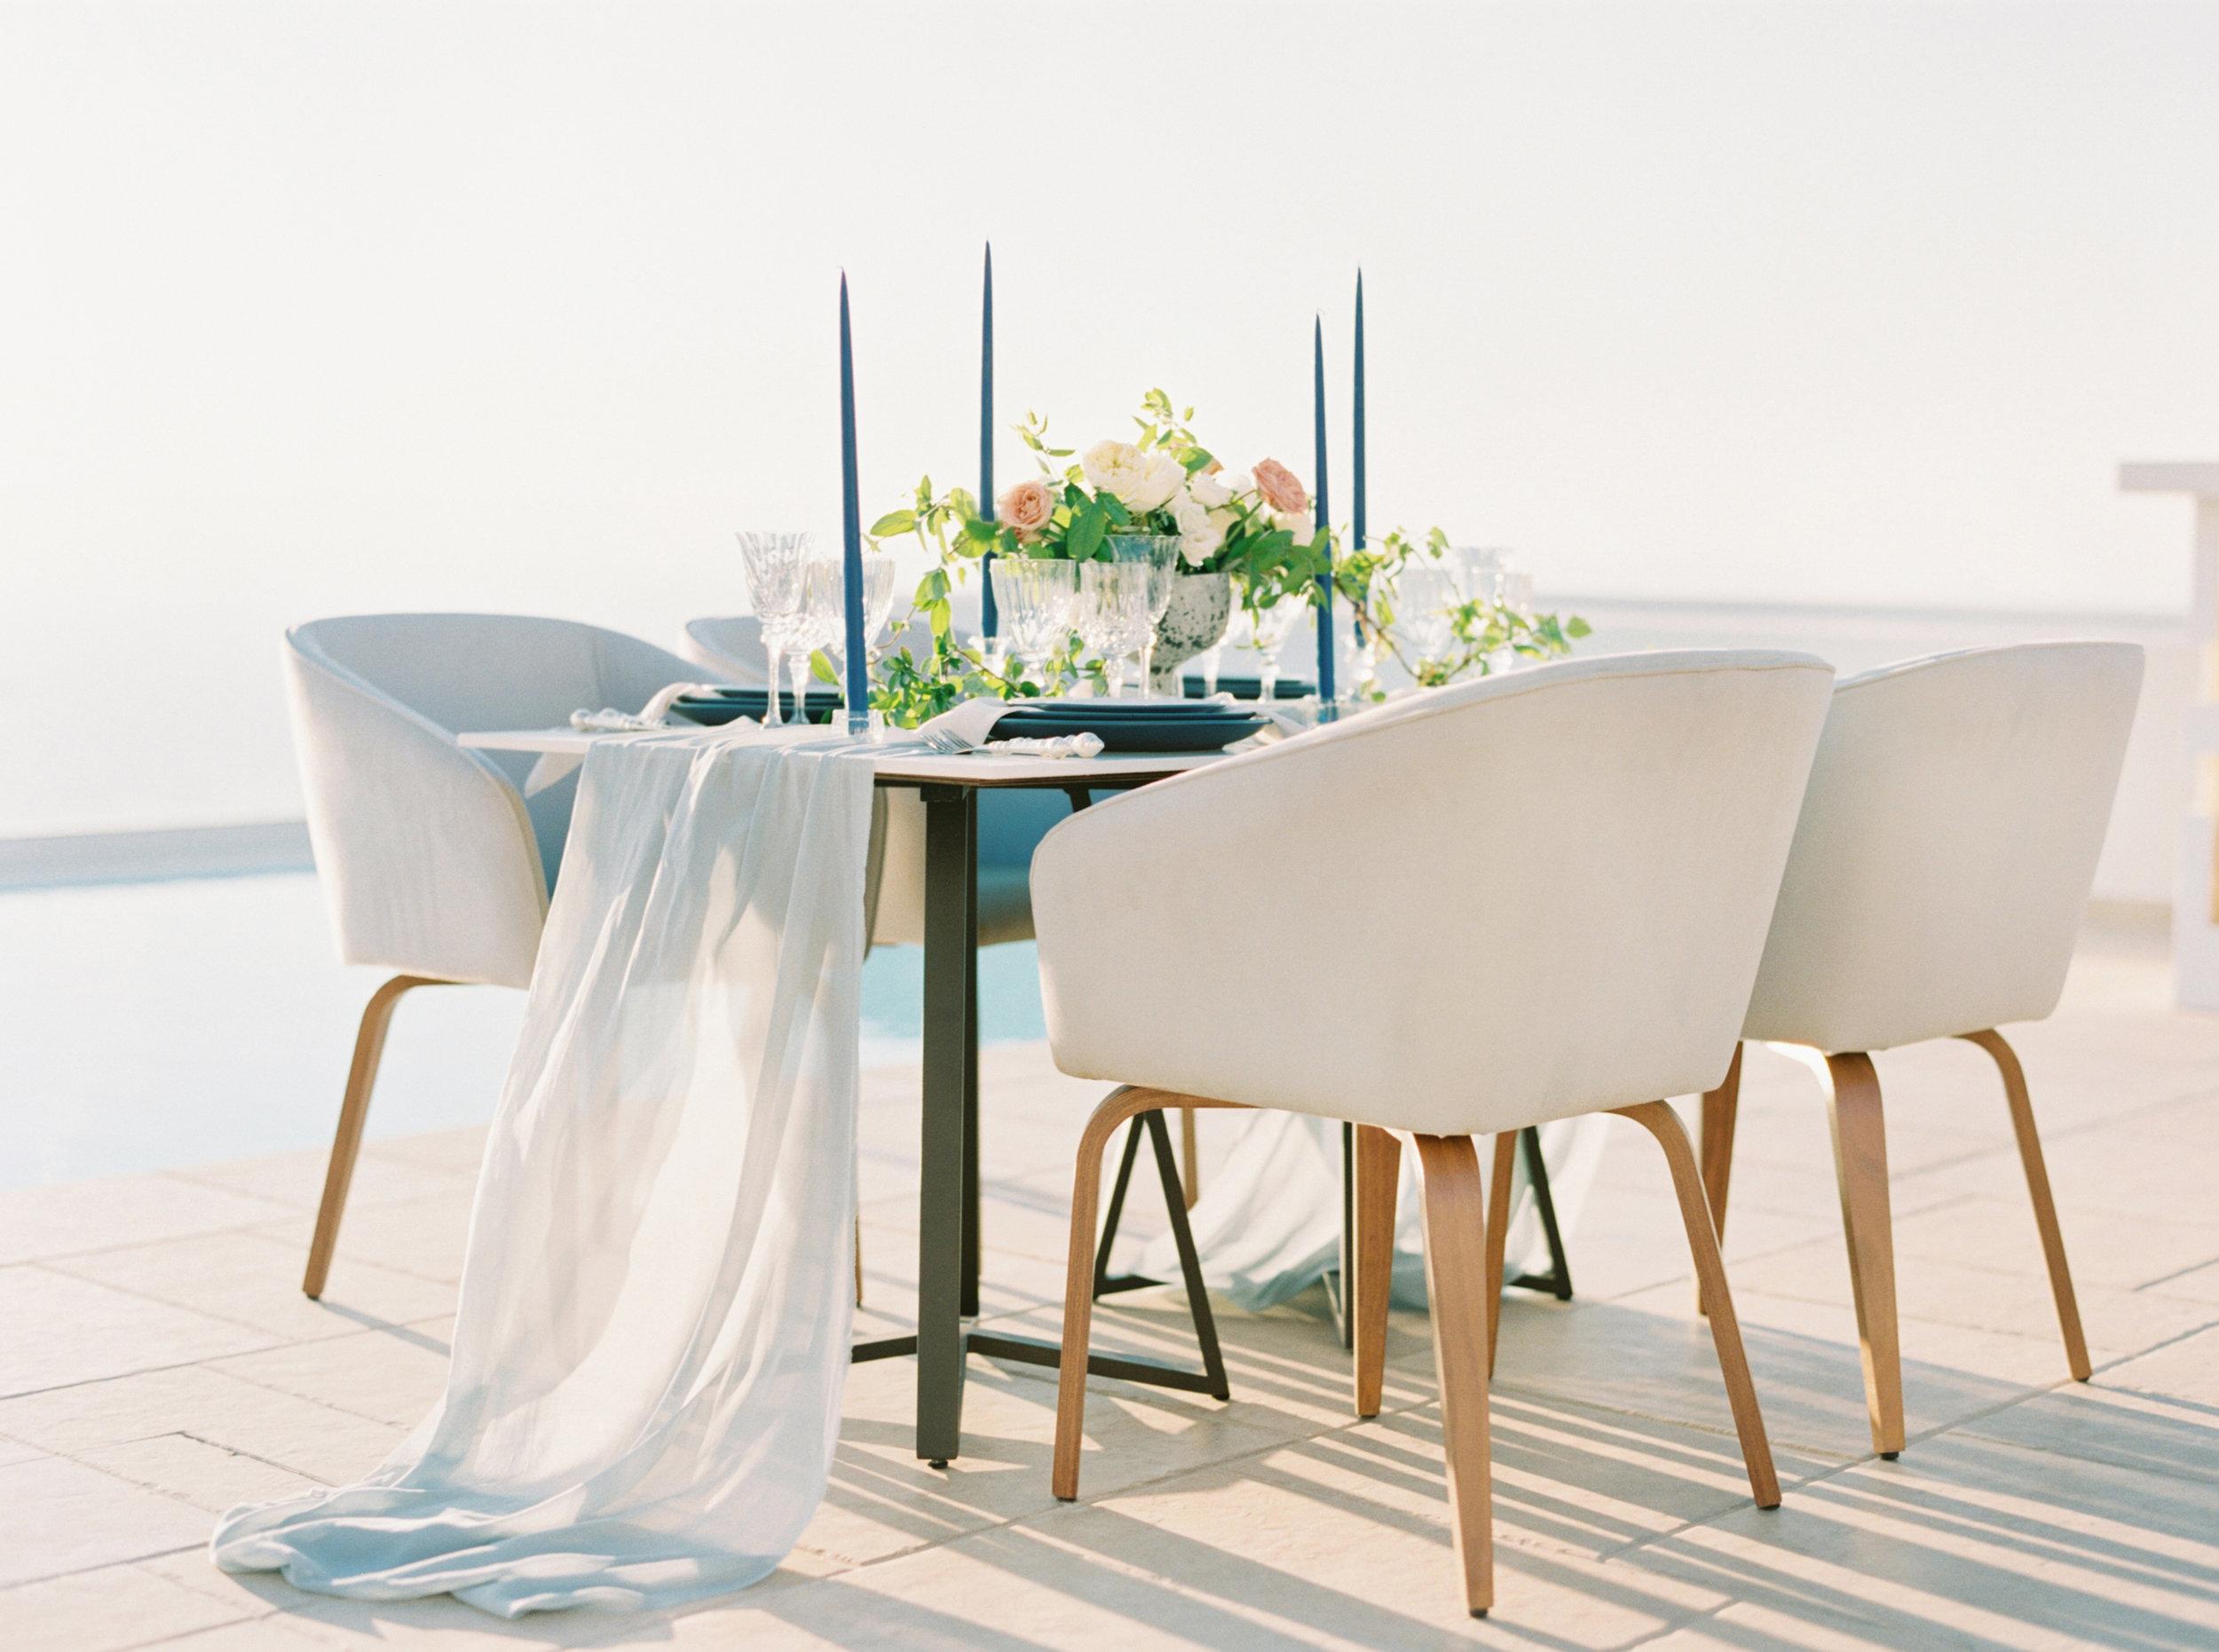 trynhphoto-photographer-destination-Santorini-Mykonos-Italy-France-wedding-photographer-destination-weddingplanner-66.jpg